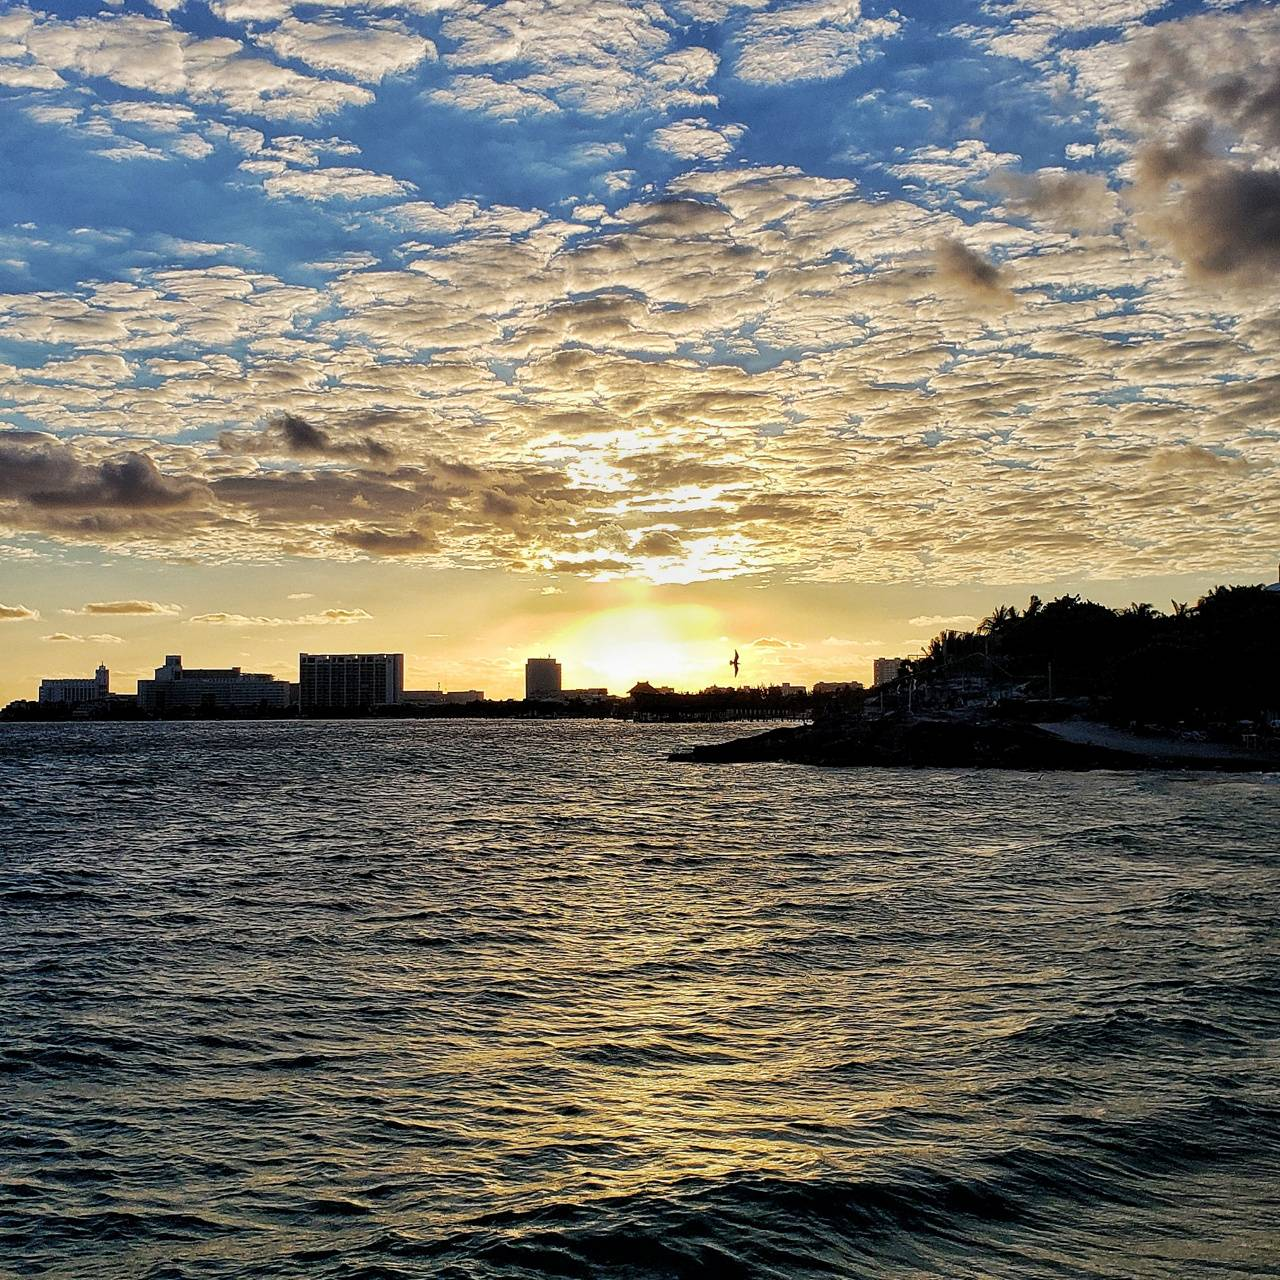 Cancun Sunset Wallpaper By Ascebras 89 Free On Zedge